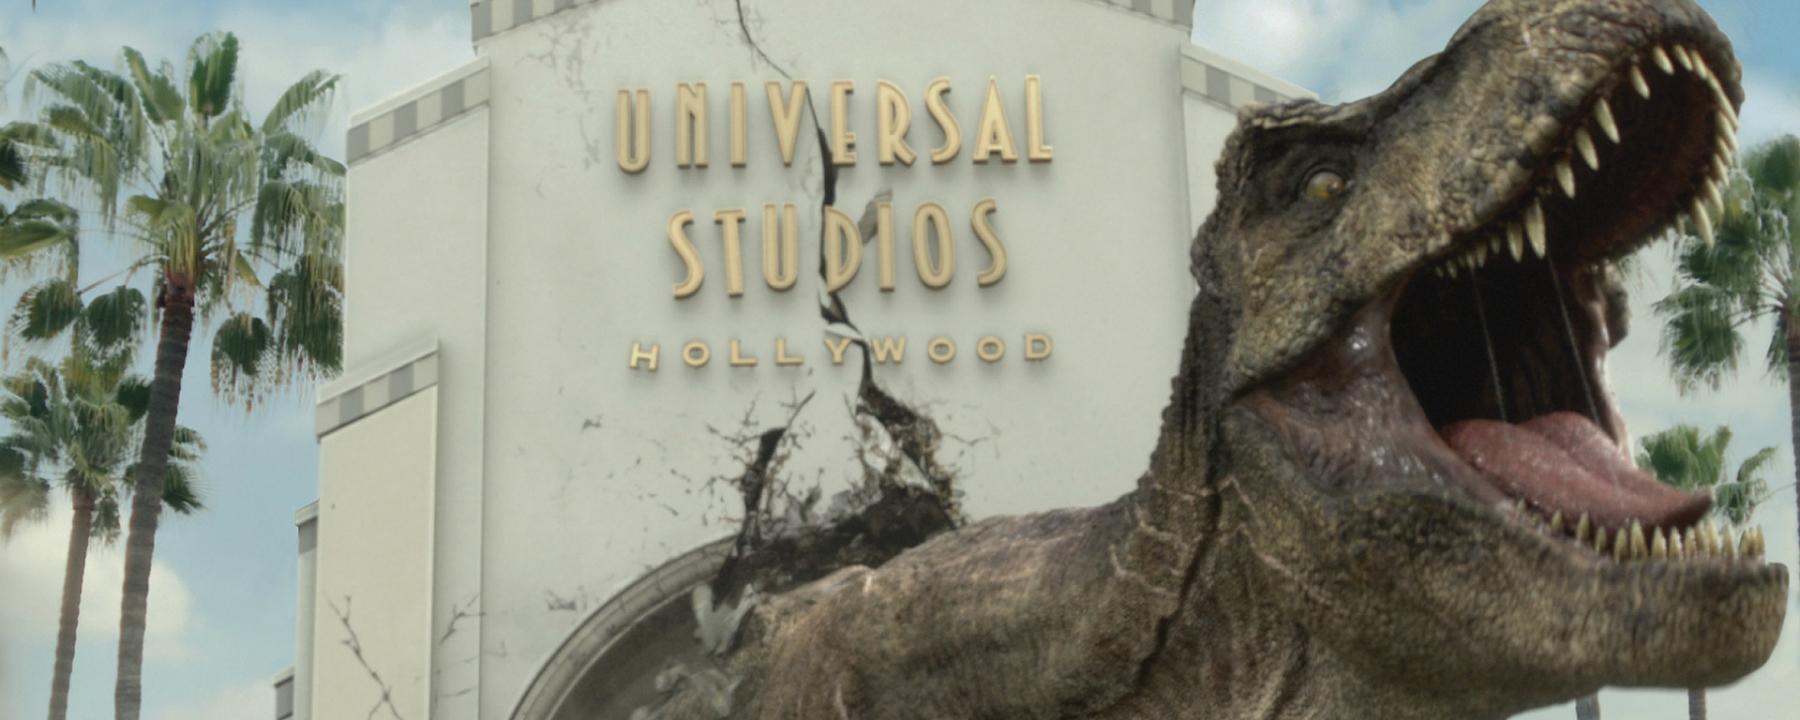 Jurassic World at Universal Studios Hollywood